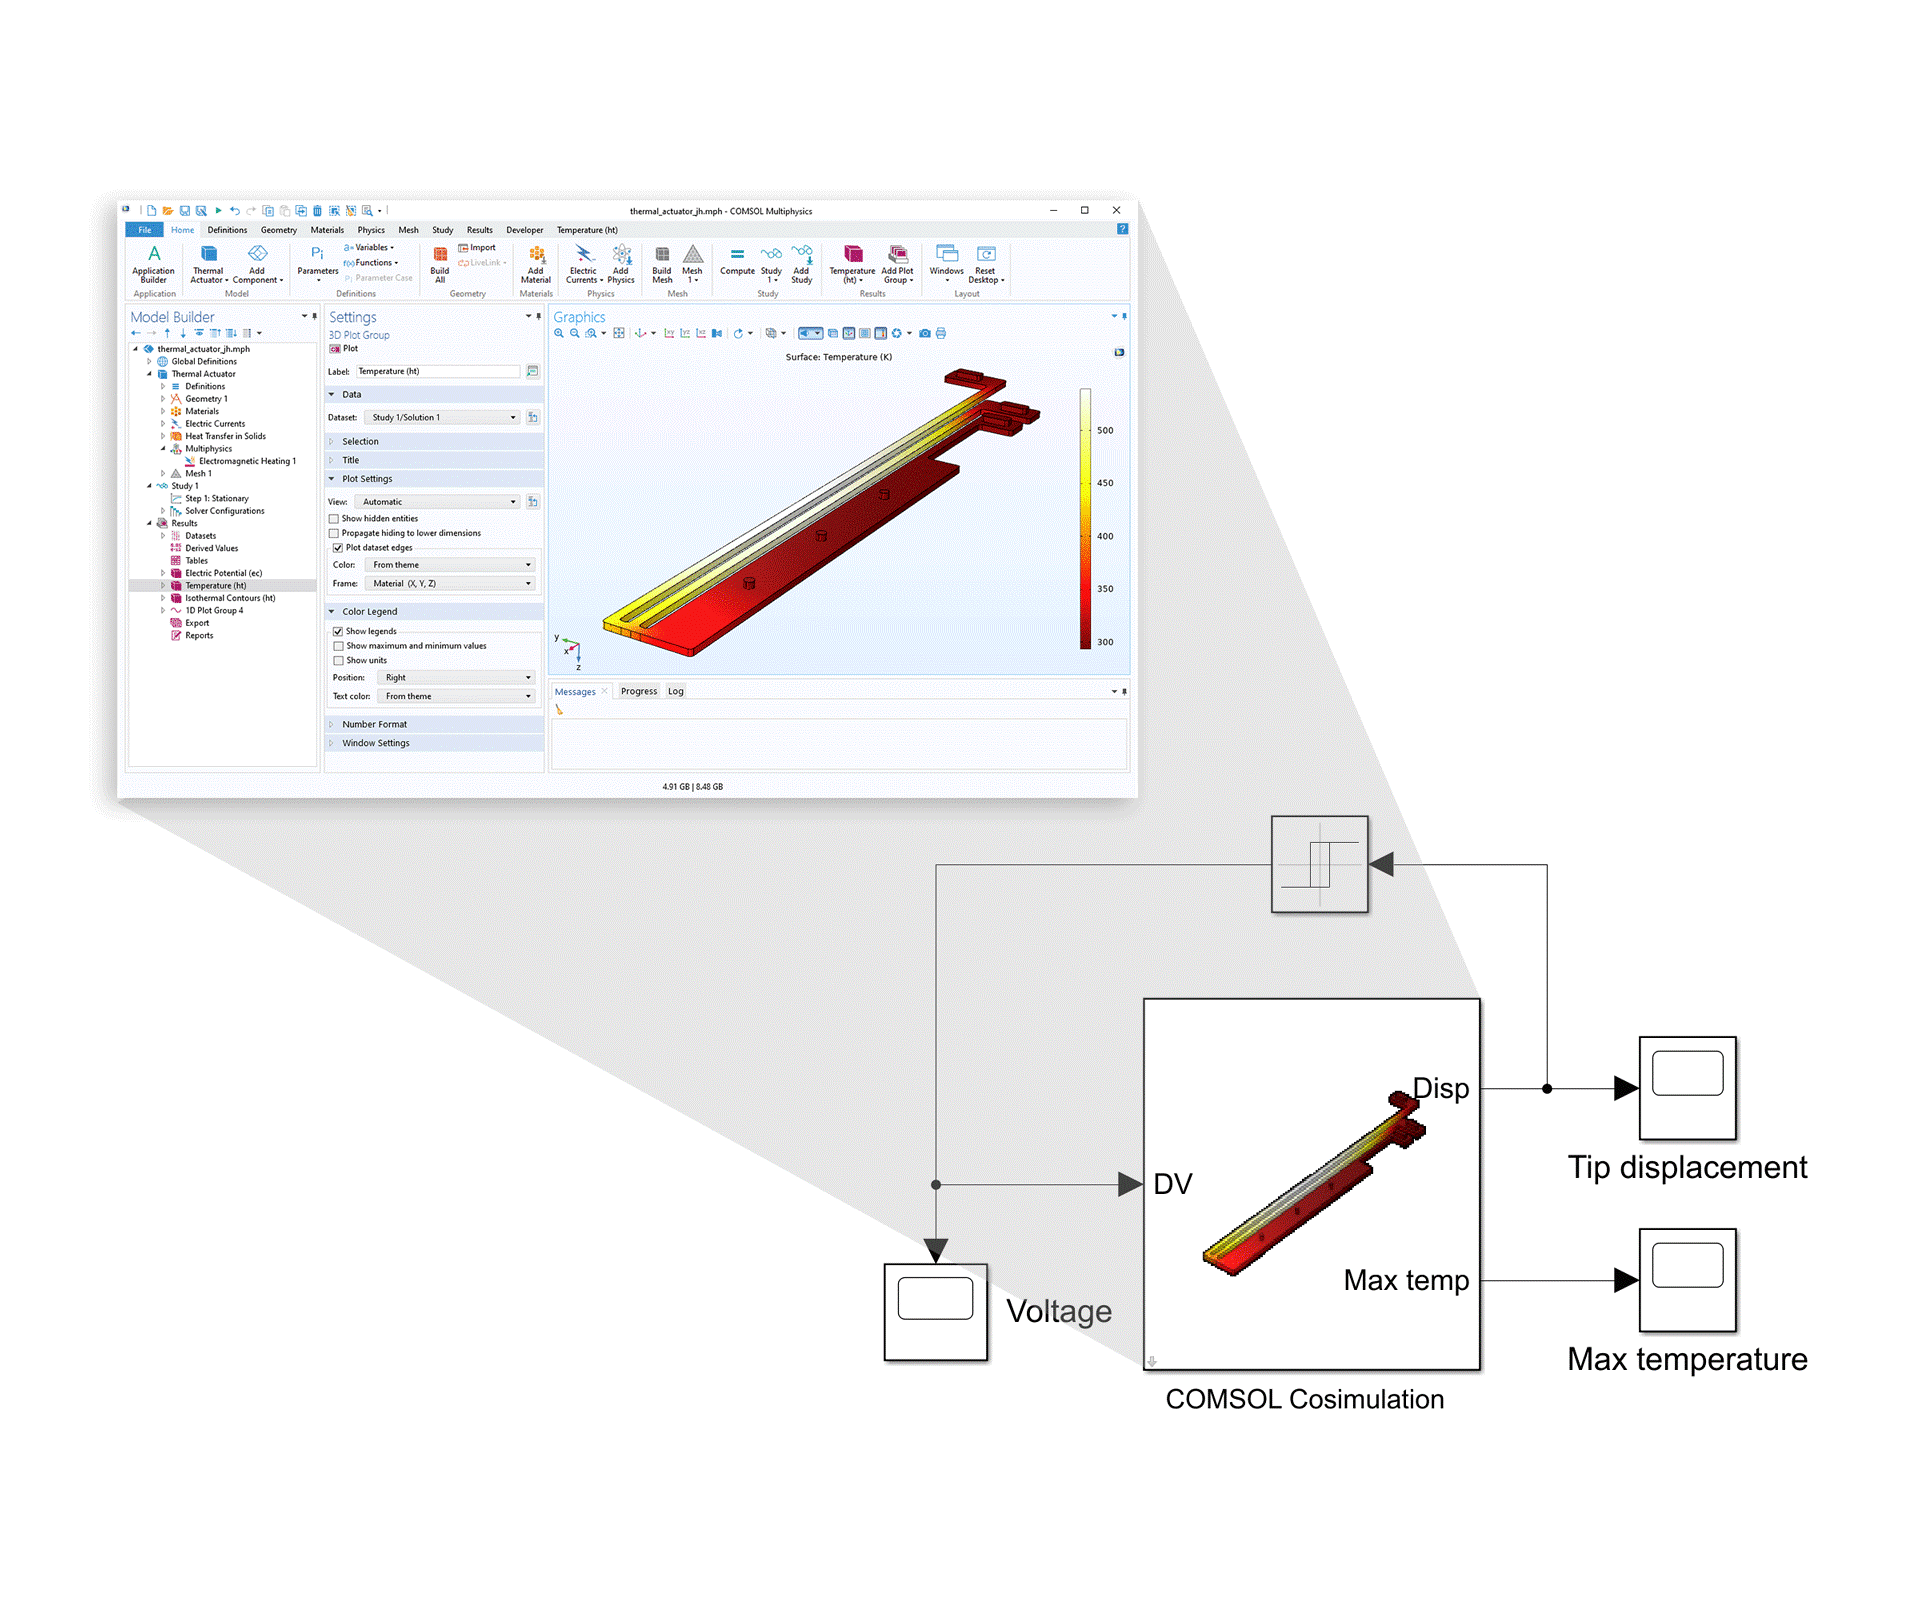 COMSOL Multiphysics®와 Simulink®를 사용해 통합 시뮬레이션한 MEMS actuator 다중물리 예제